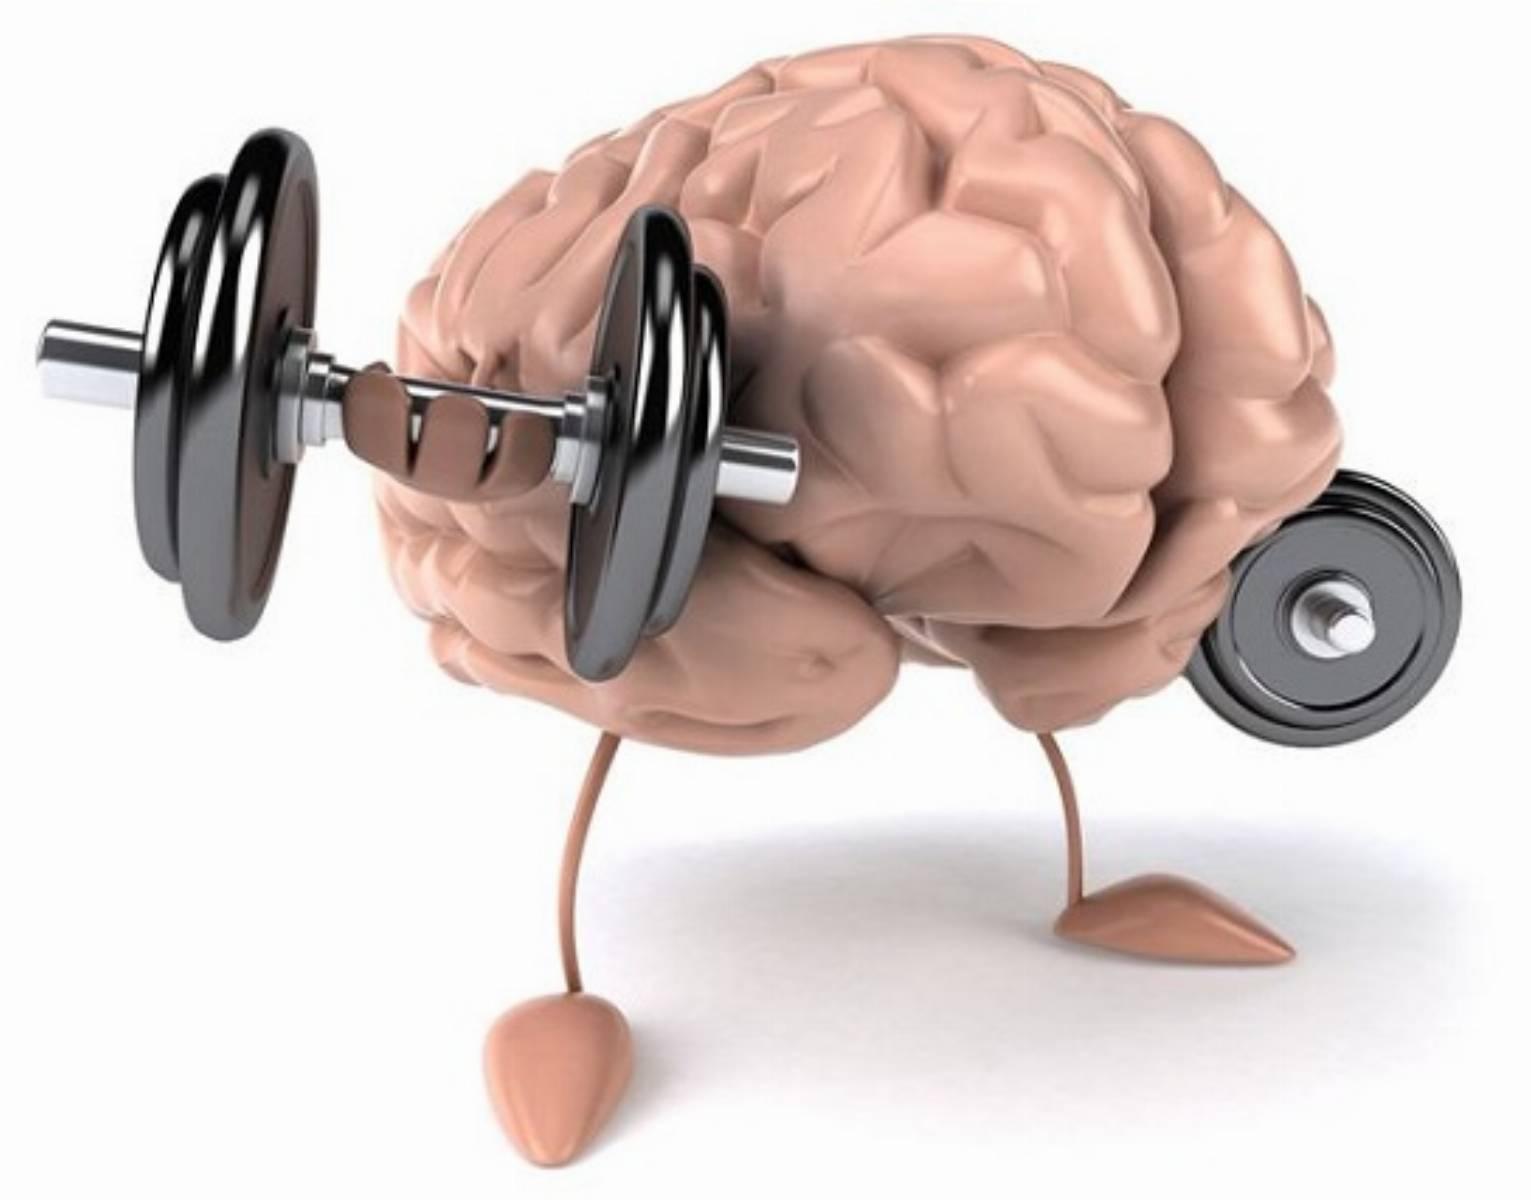 Zdrowy mozg